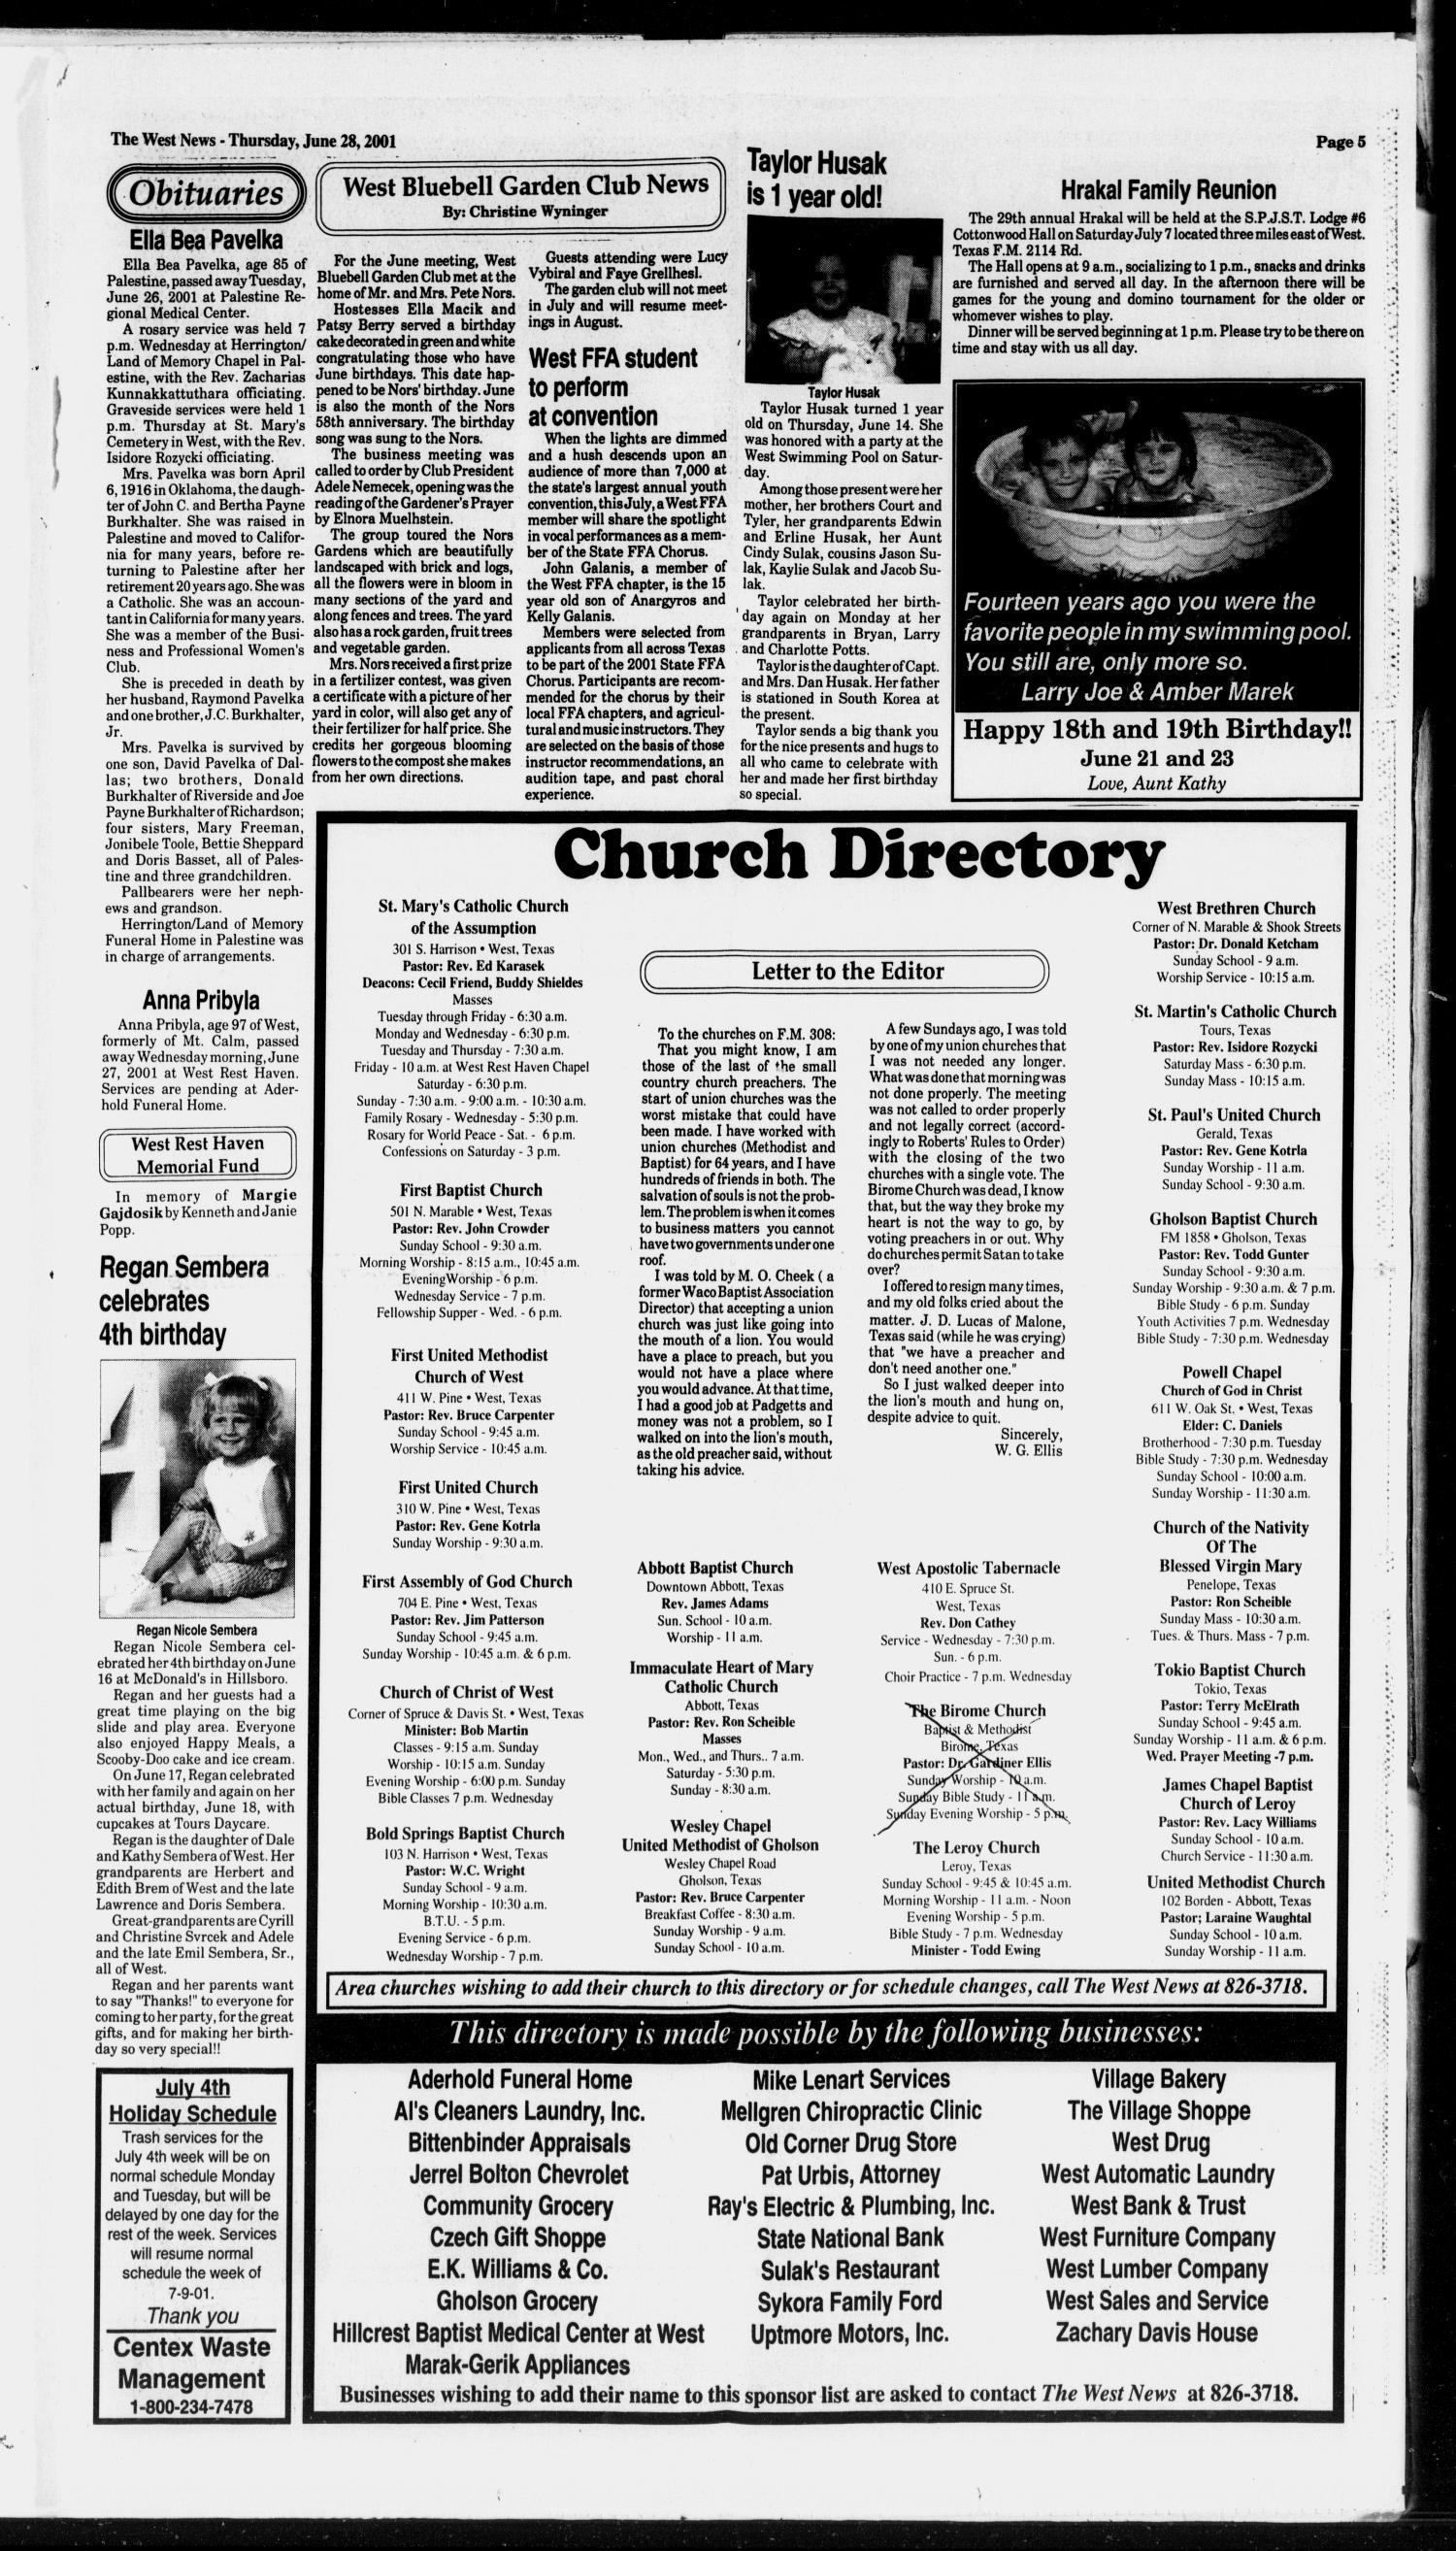 The West News (West, Tex ), Vol  111, No  26, Ed  1 Thursday